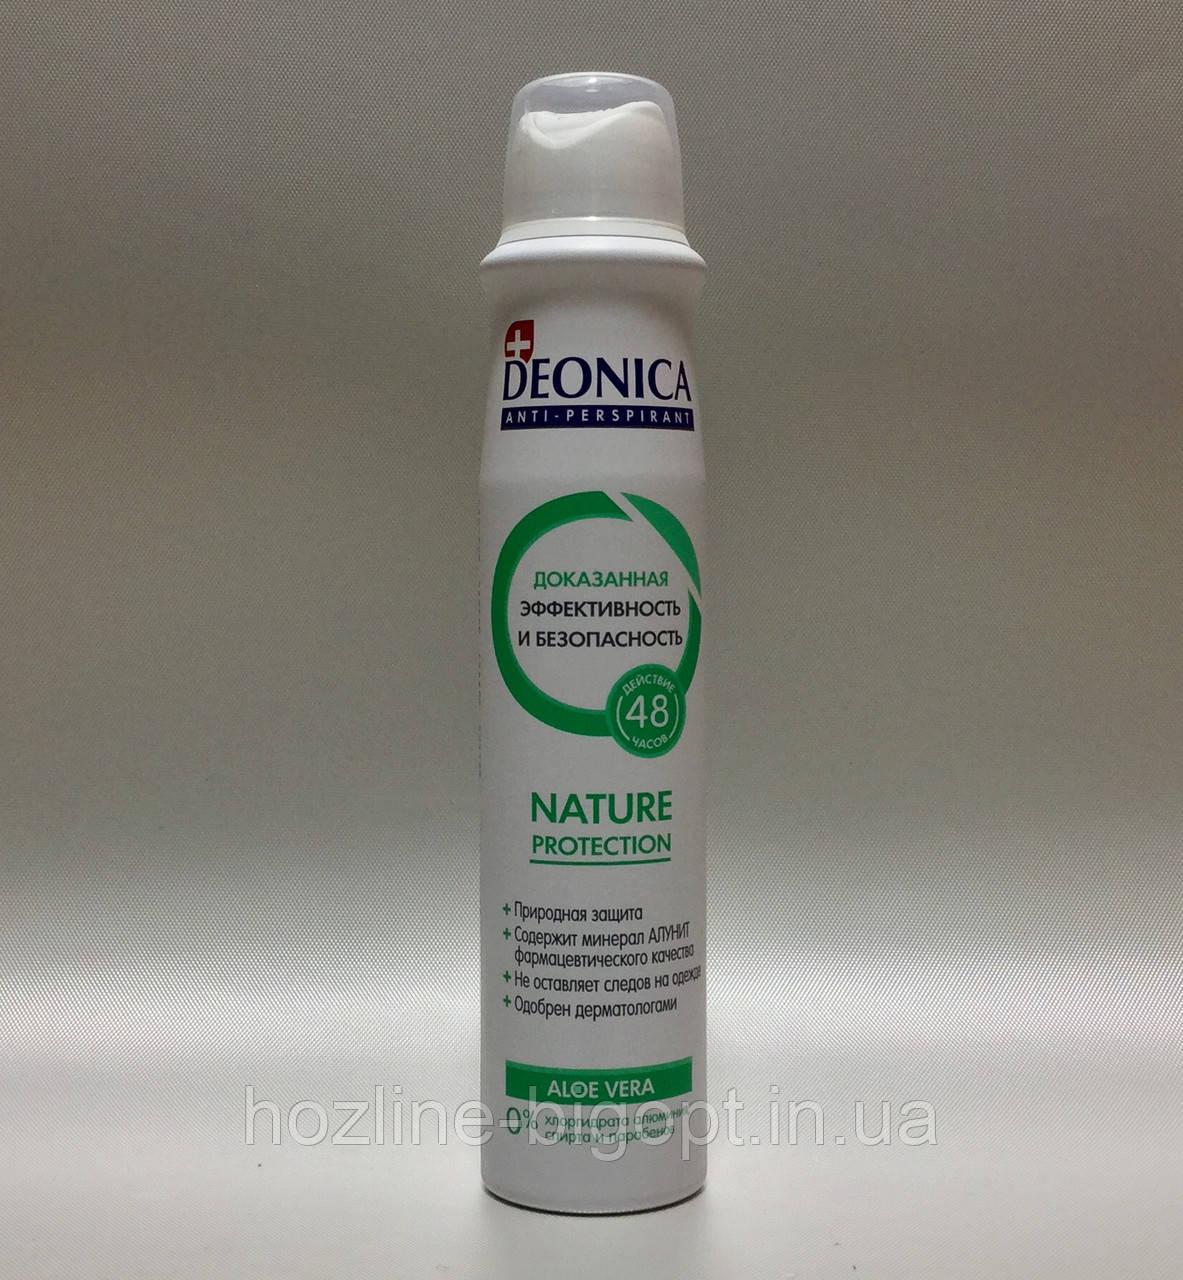 Deonica NATURE PROTECTION Антиперспирант 200 мл.